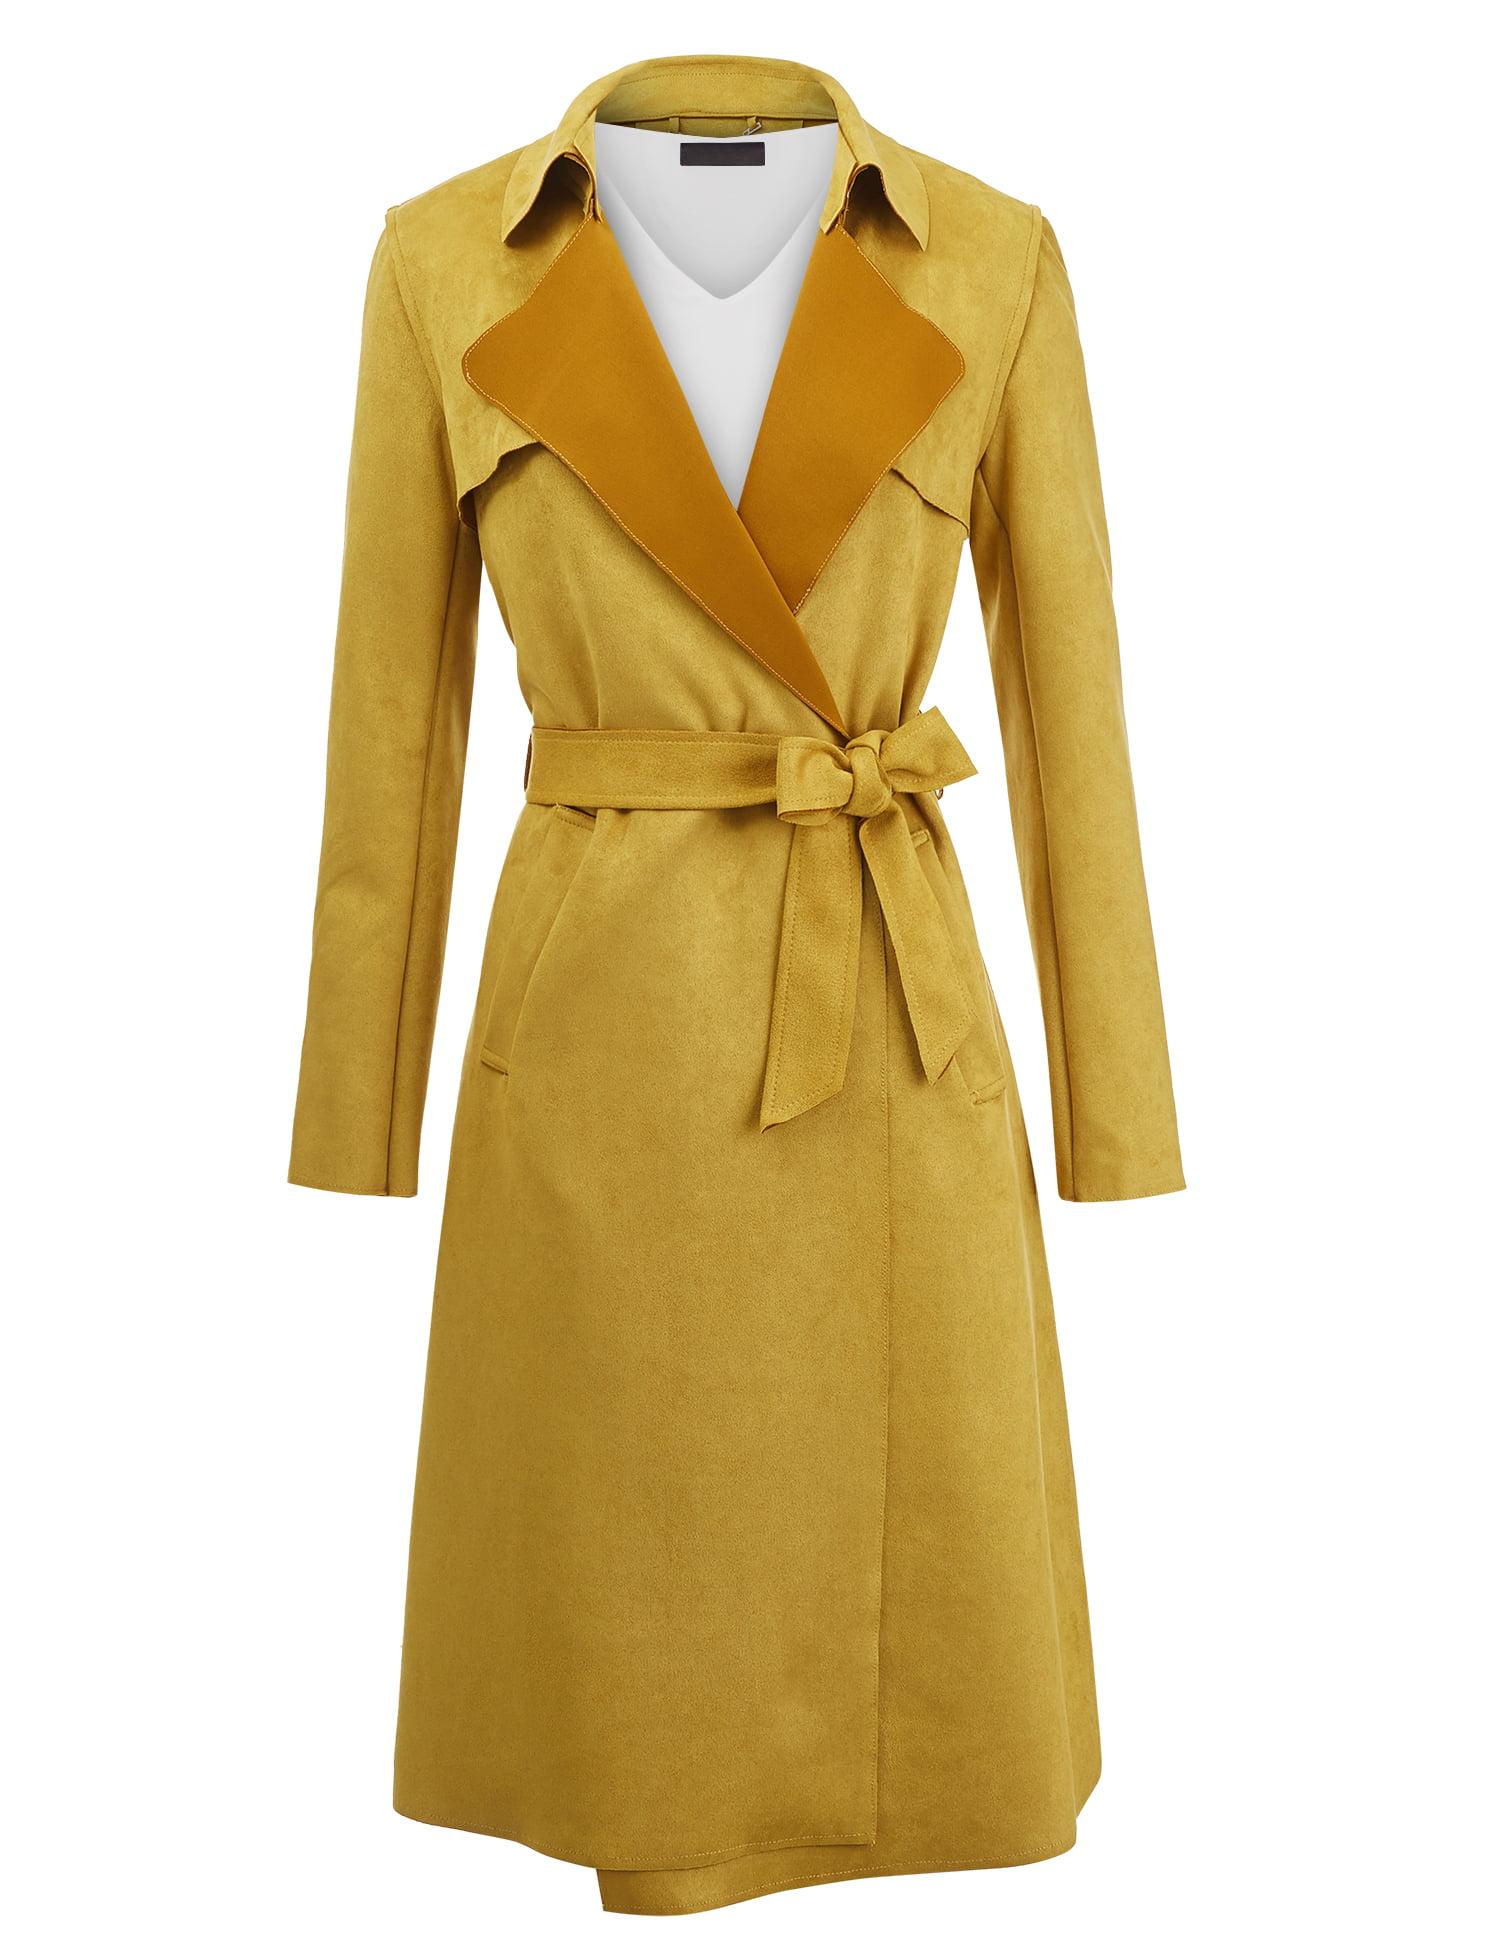 Golden Promise Equipment Woolen Leather Long Trench Coat